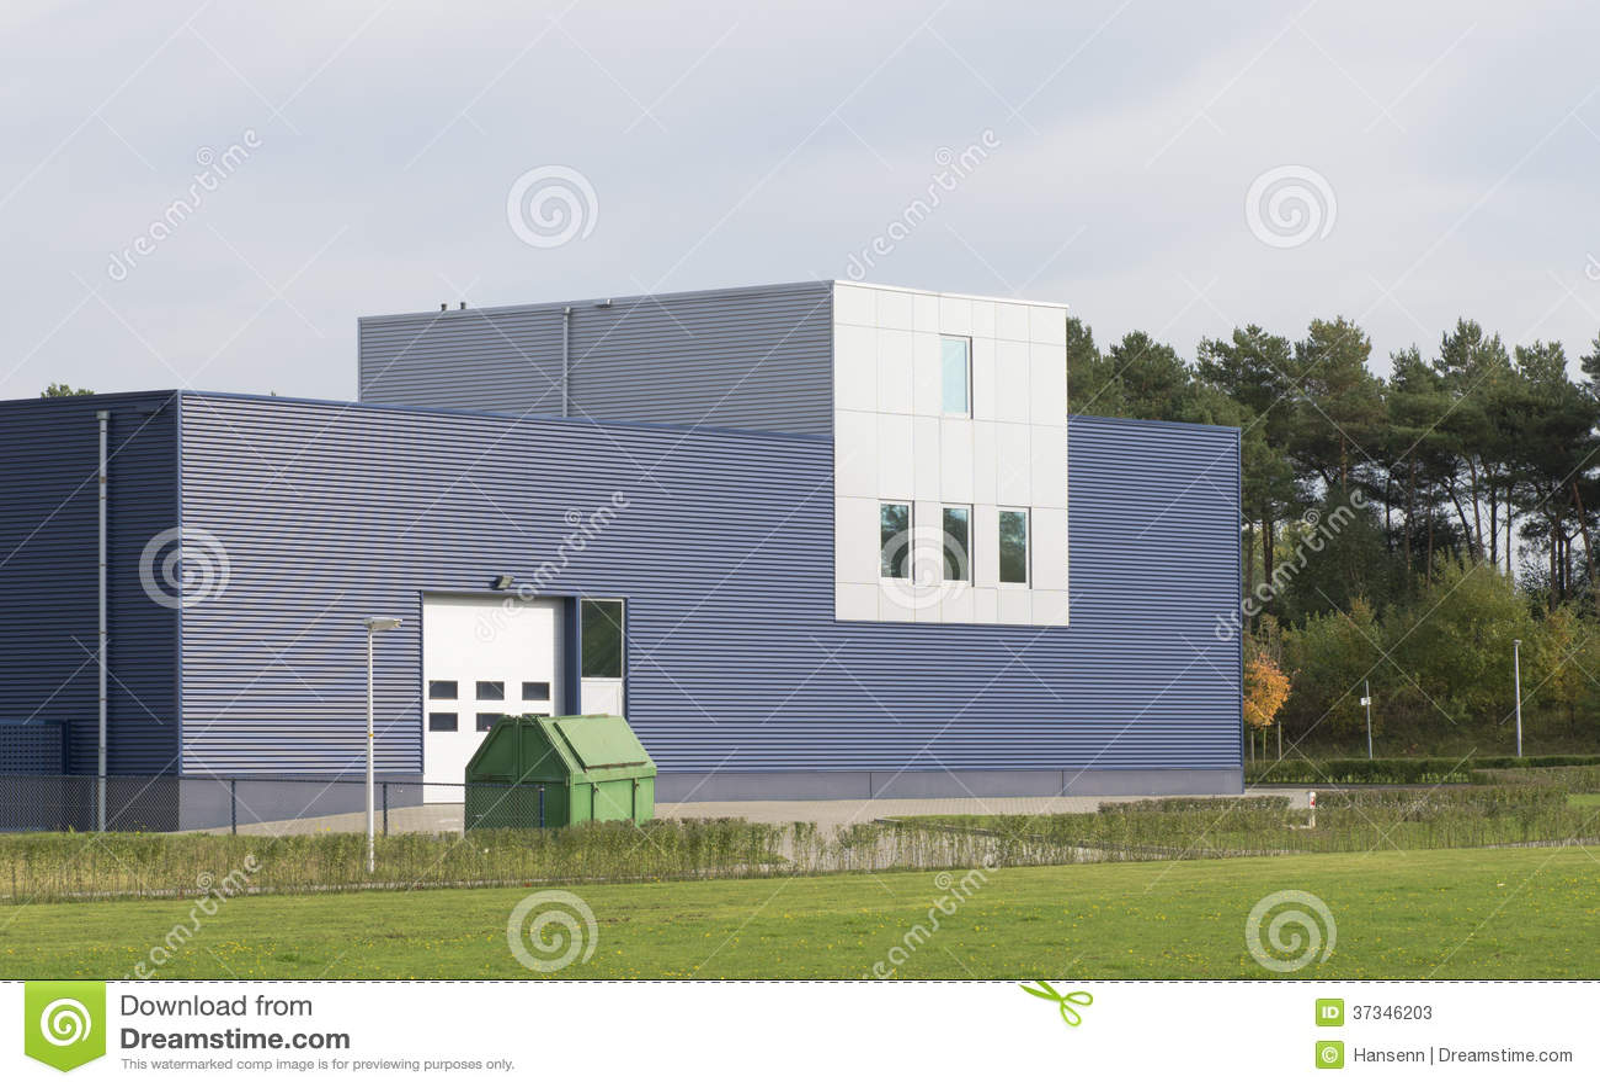 Warehouse Exterior Stock Photos - Image: 37346203